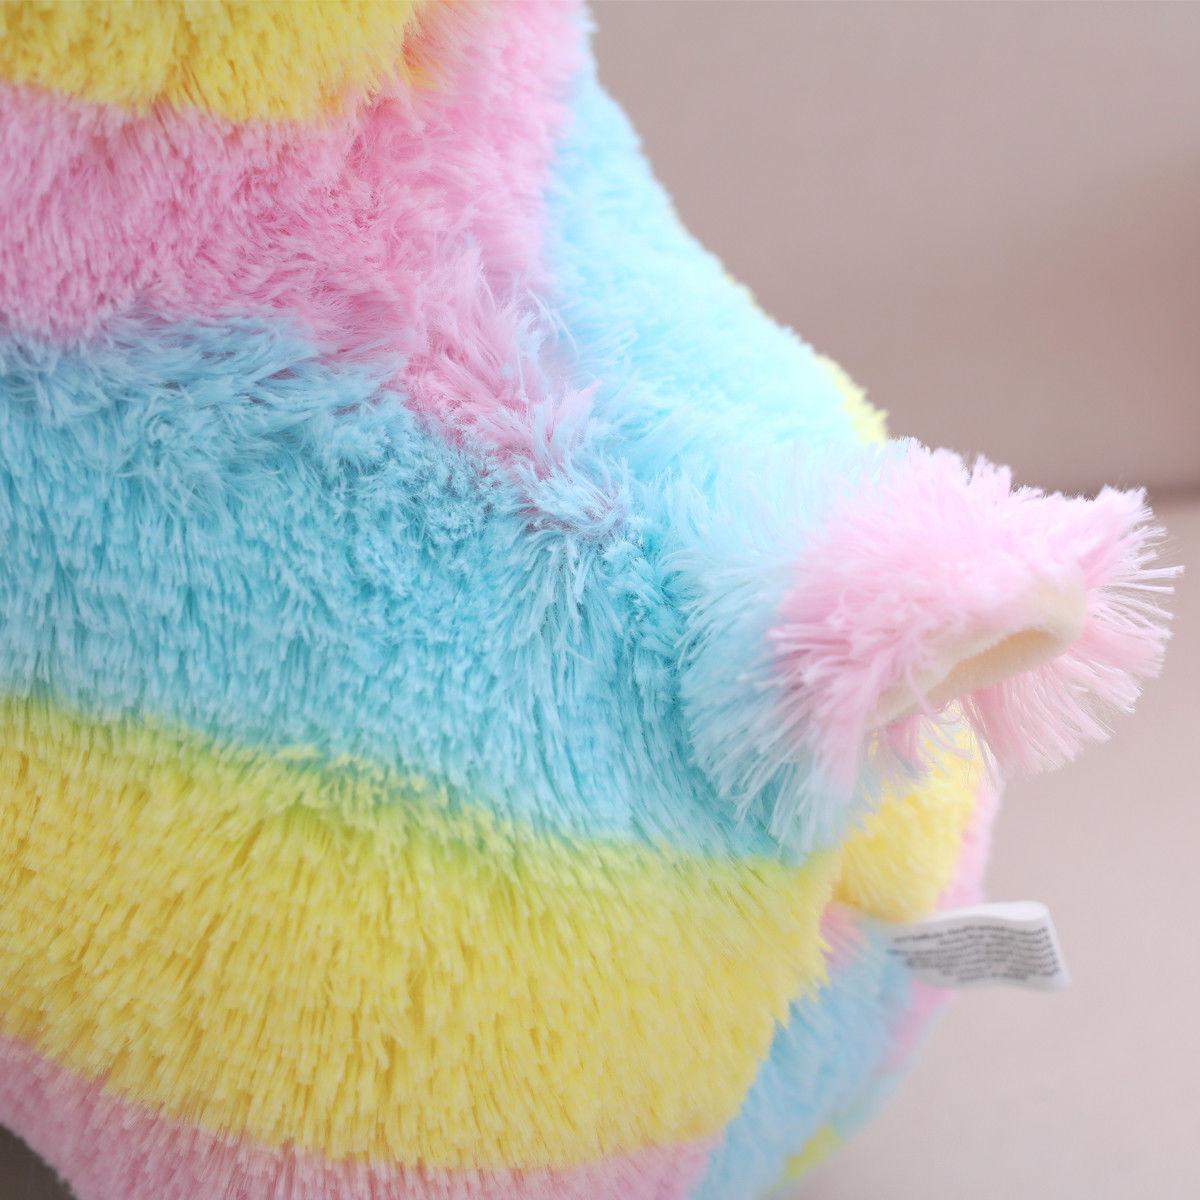 Winsterch Toy Alpaca Llama Animal 17.7